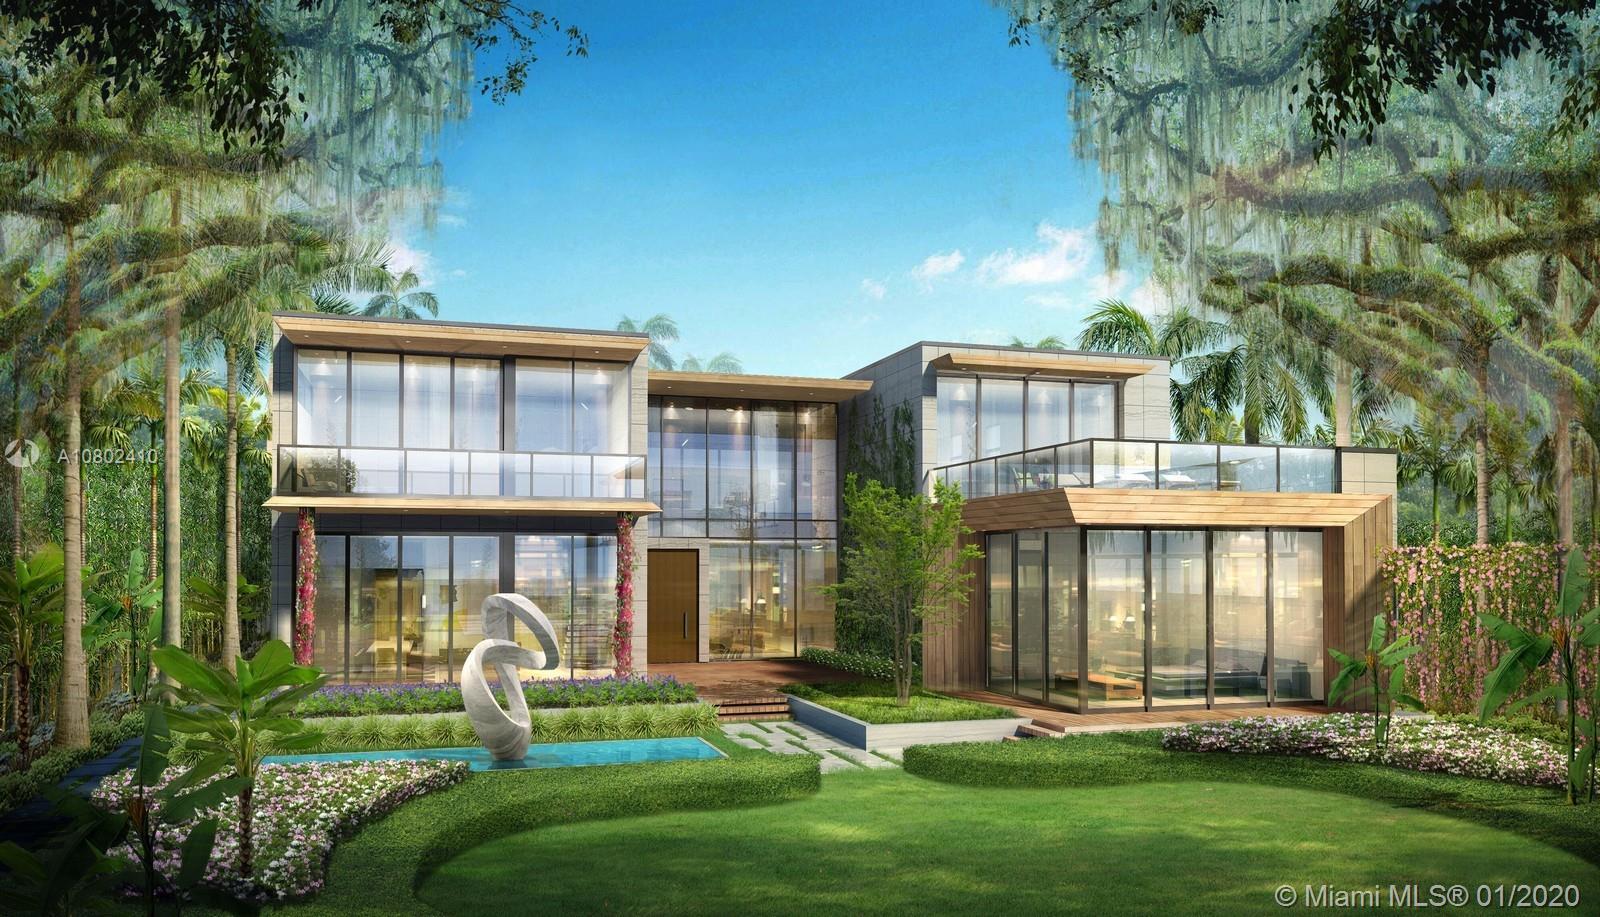 158 Palm Ave, Miami Beach, FL 33139